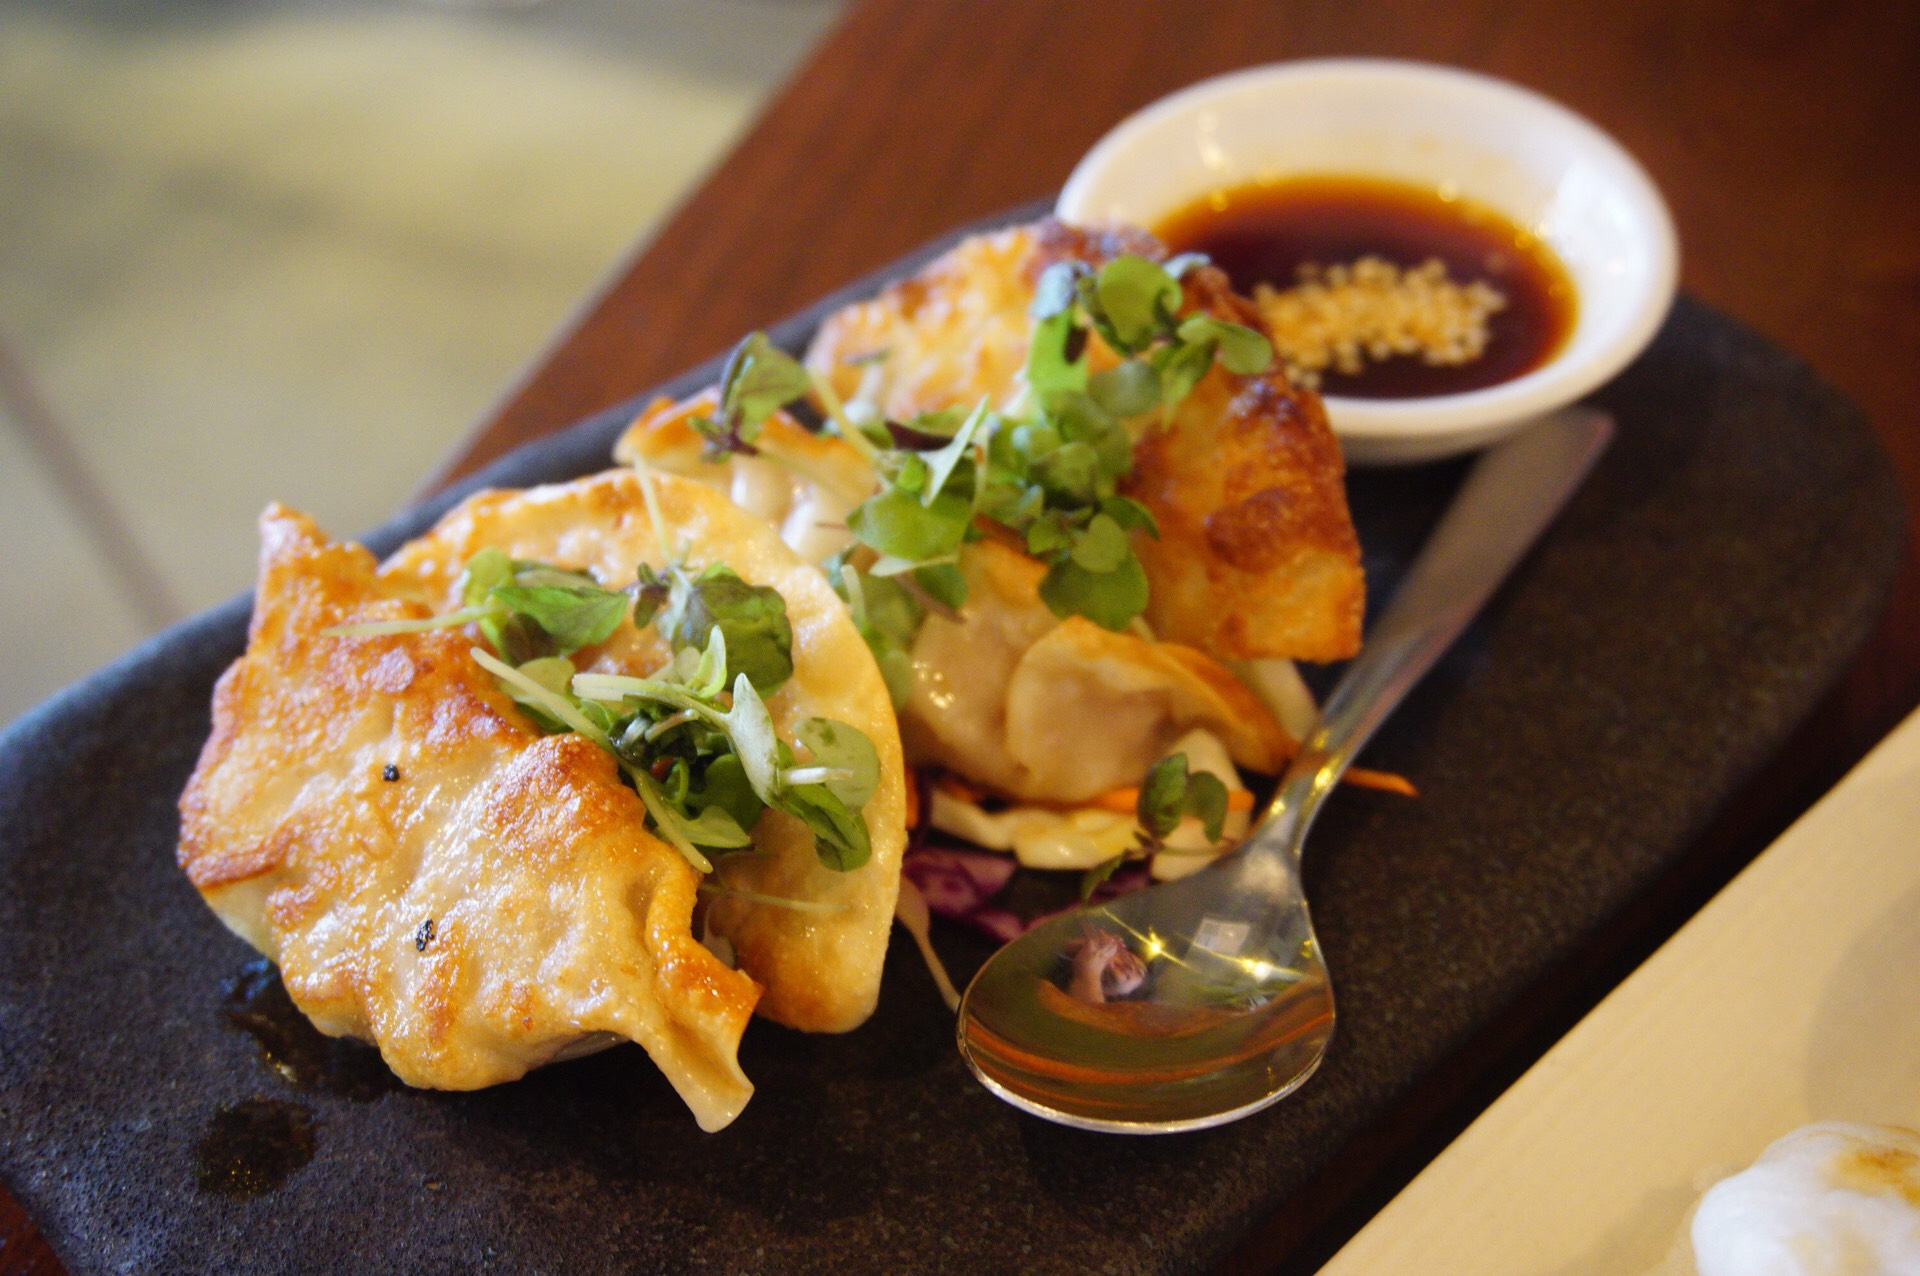 We have chicken and mushroom dumpling here!